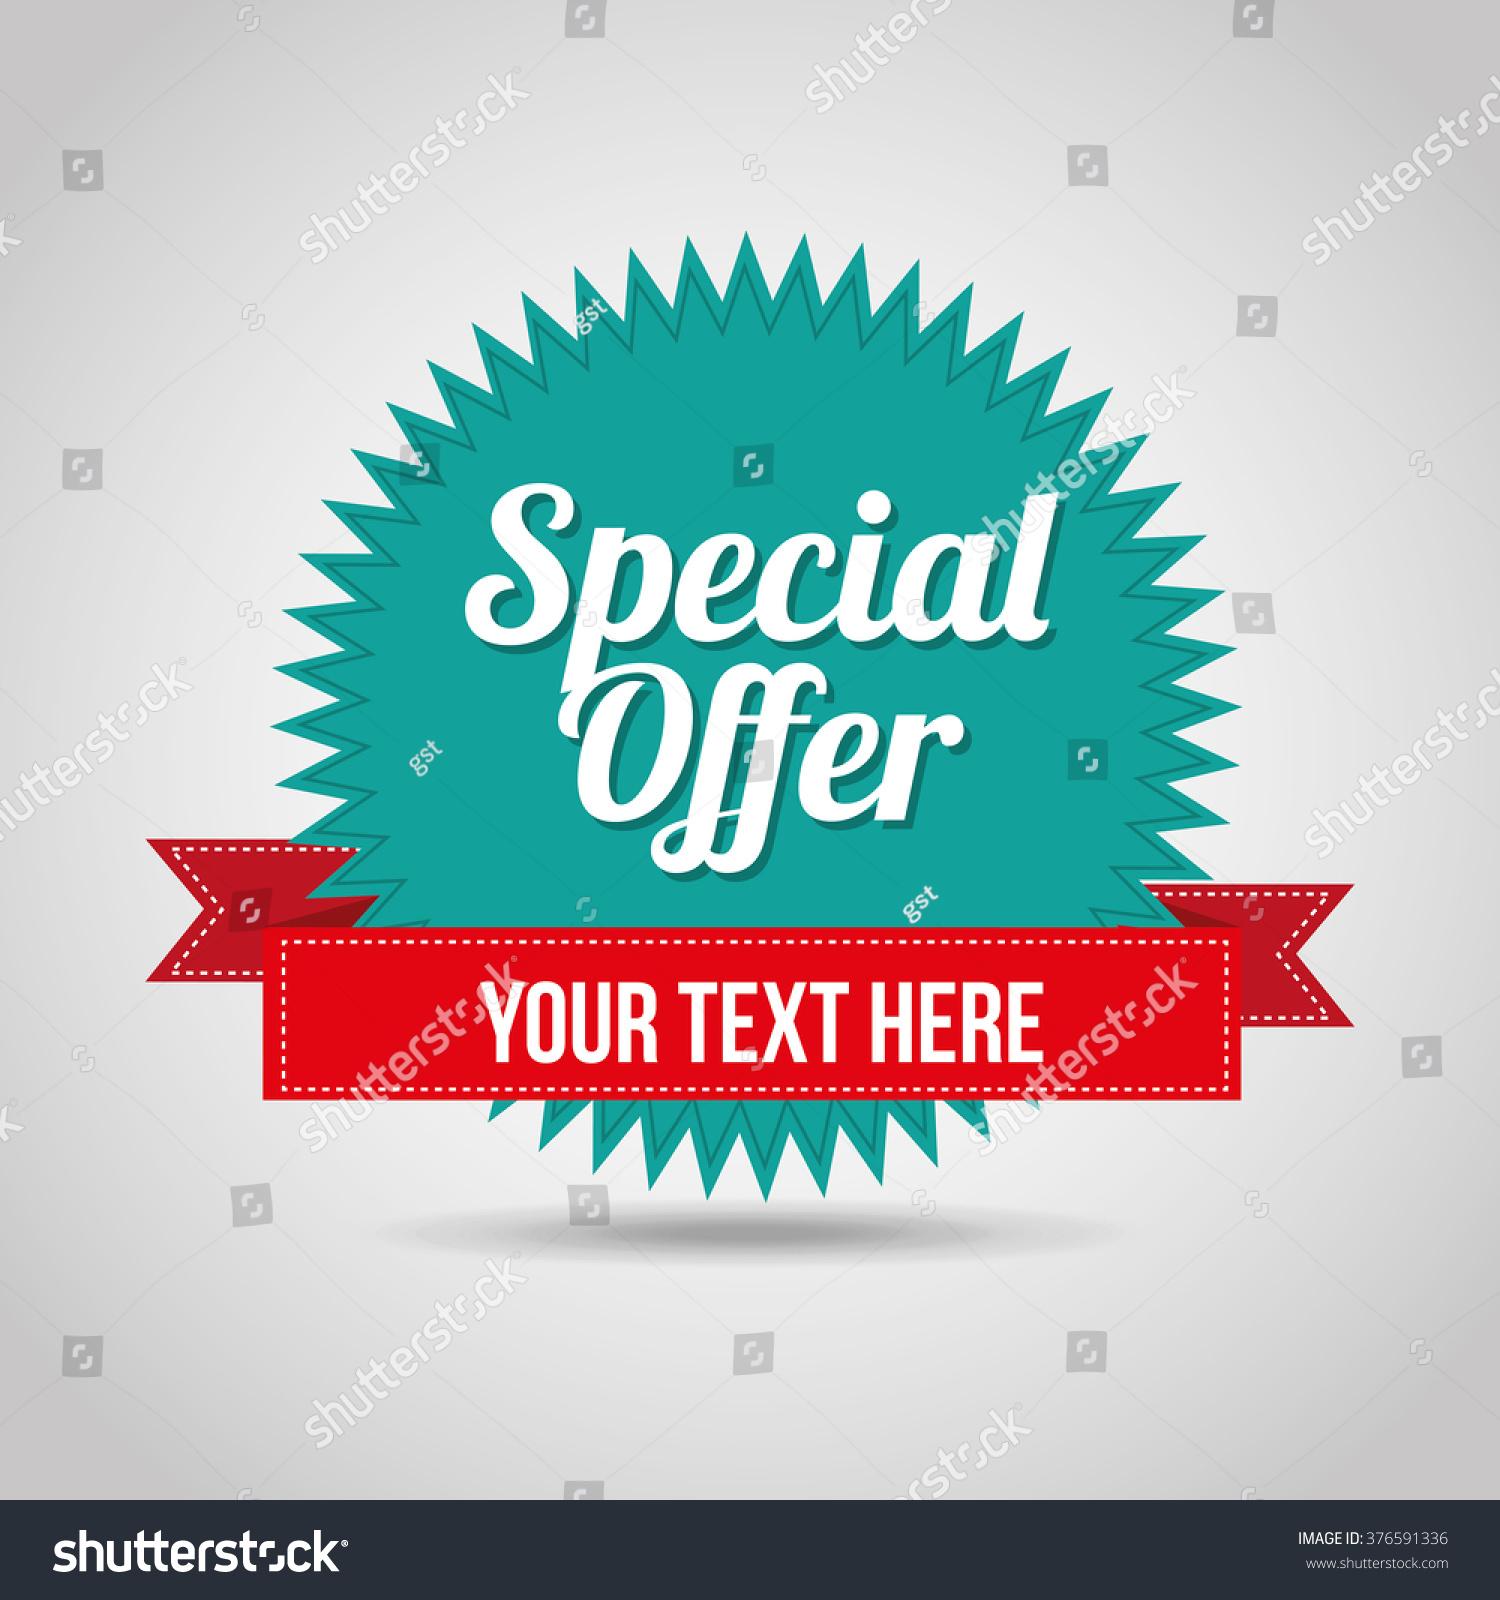 27 Cheap Design Ideas Offering: Special Offer Design Stock Vector 376591336